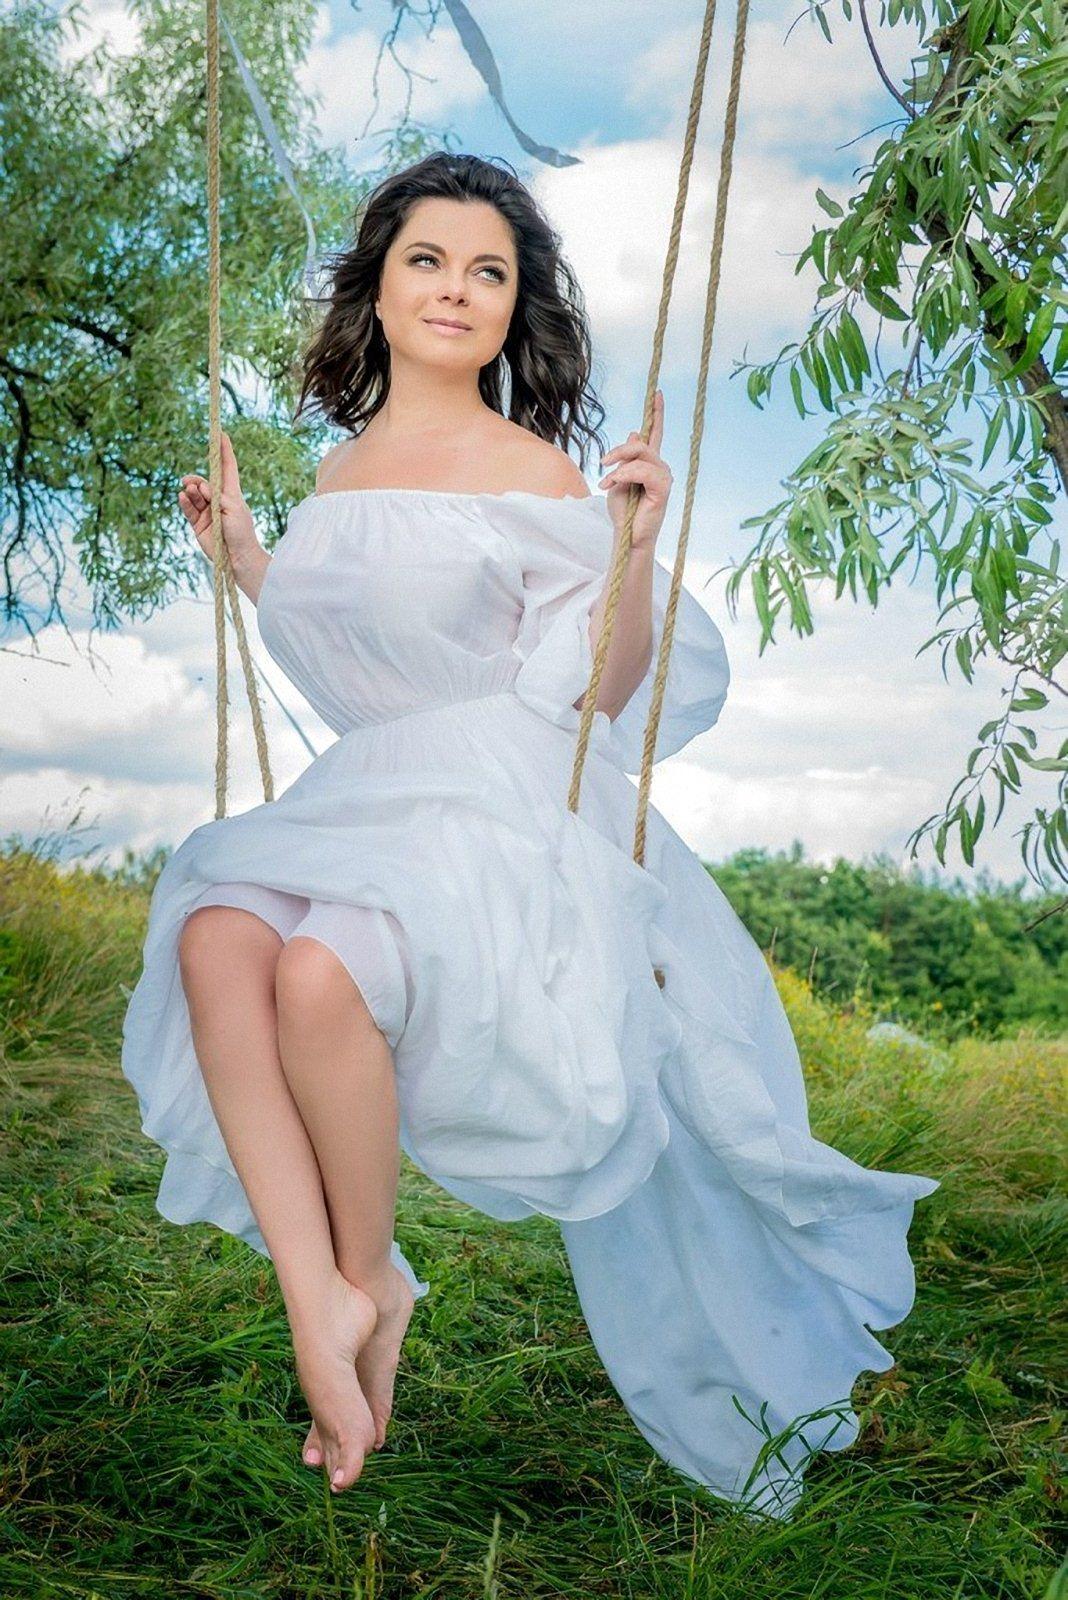 http://pics.wikifeet.com/Natasha-Korolyova-Feet-1451128.jpg